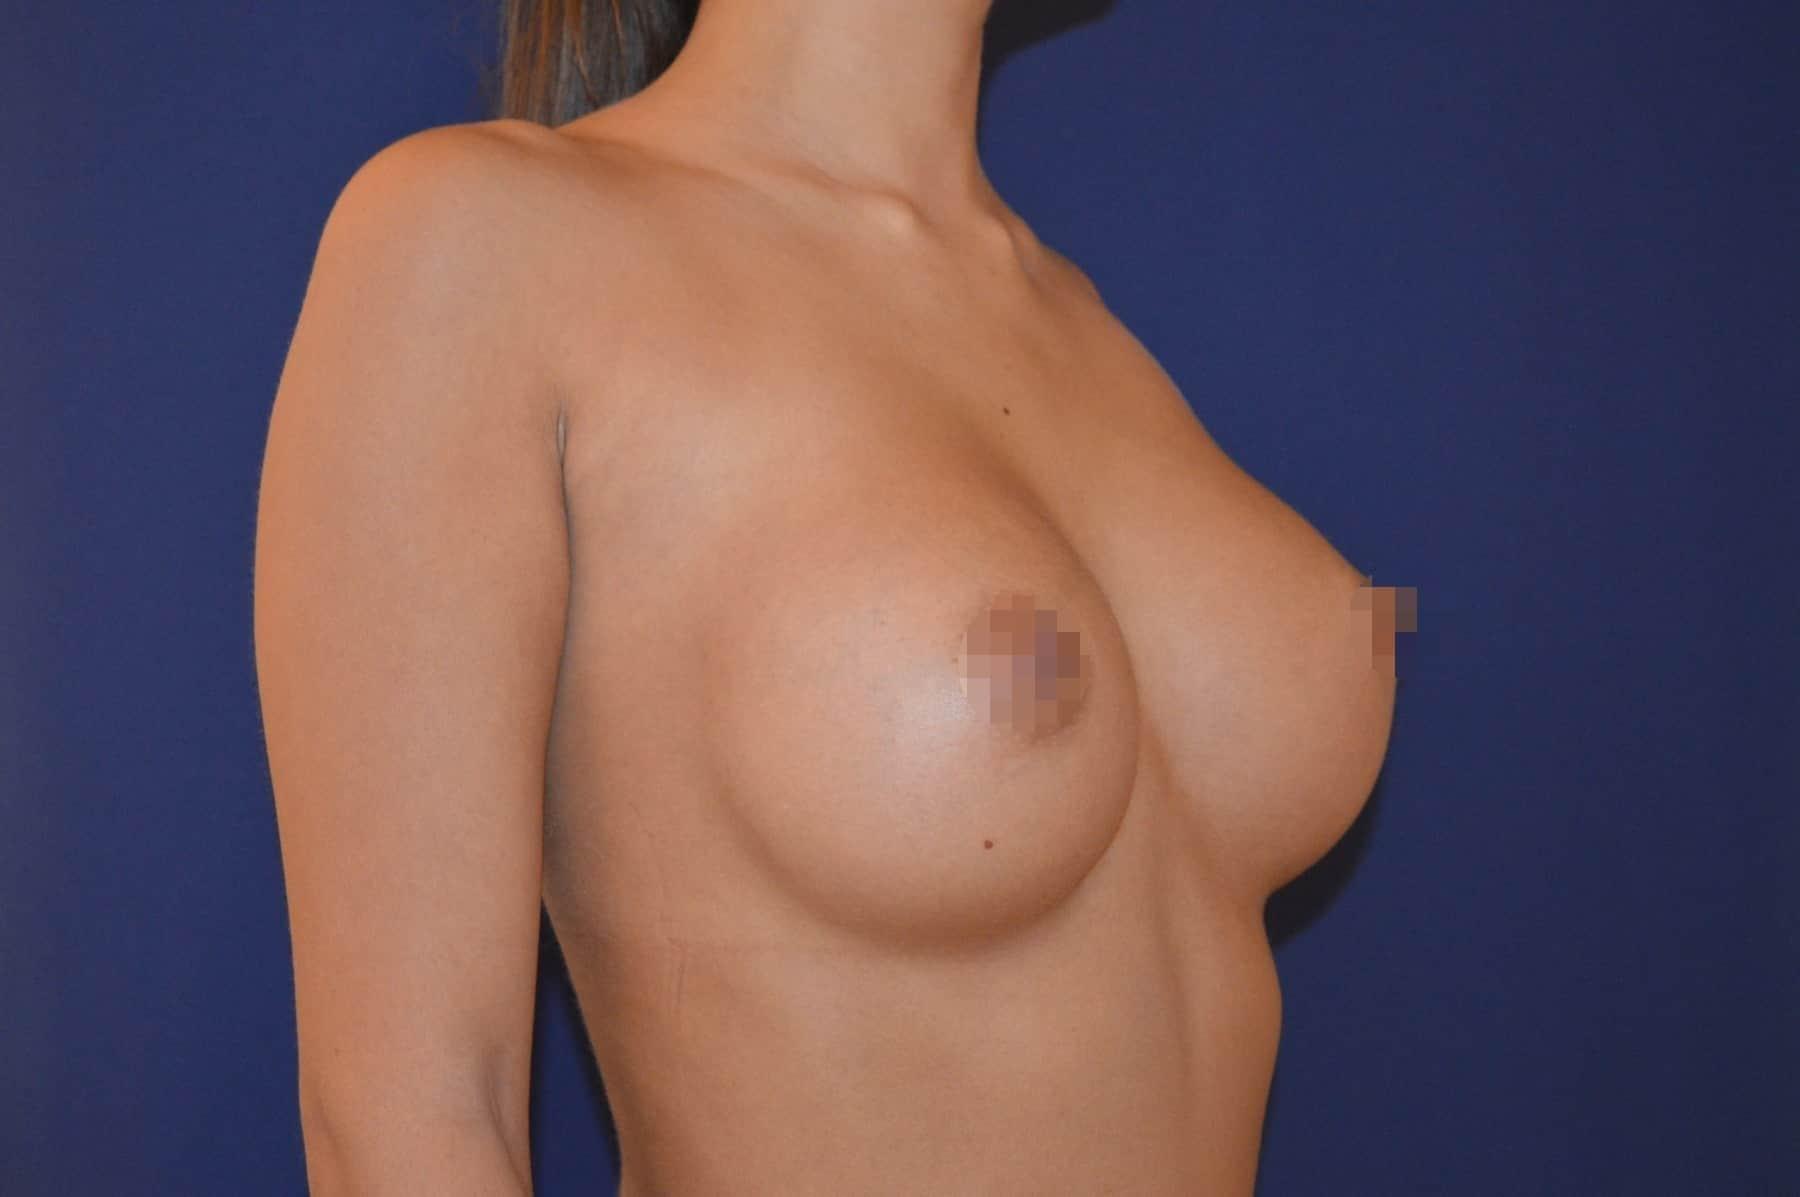 Brustvergrößerung A auf B